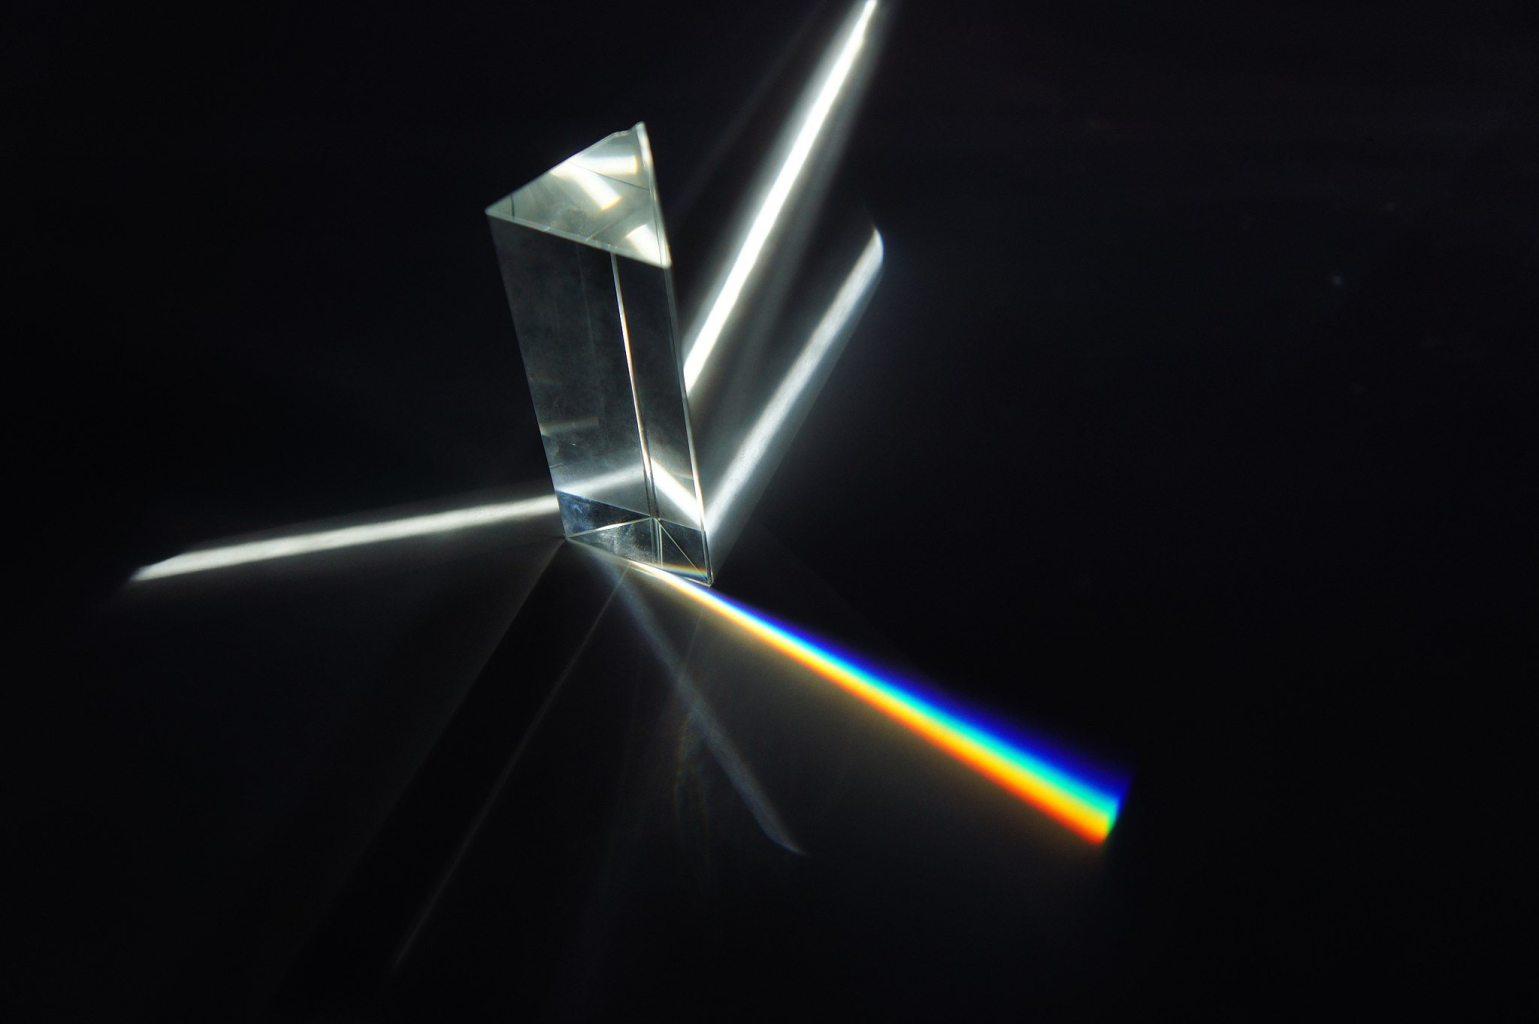 Image: Prism